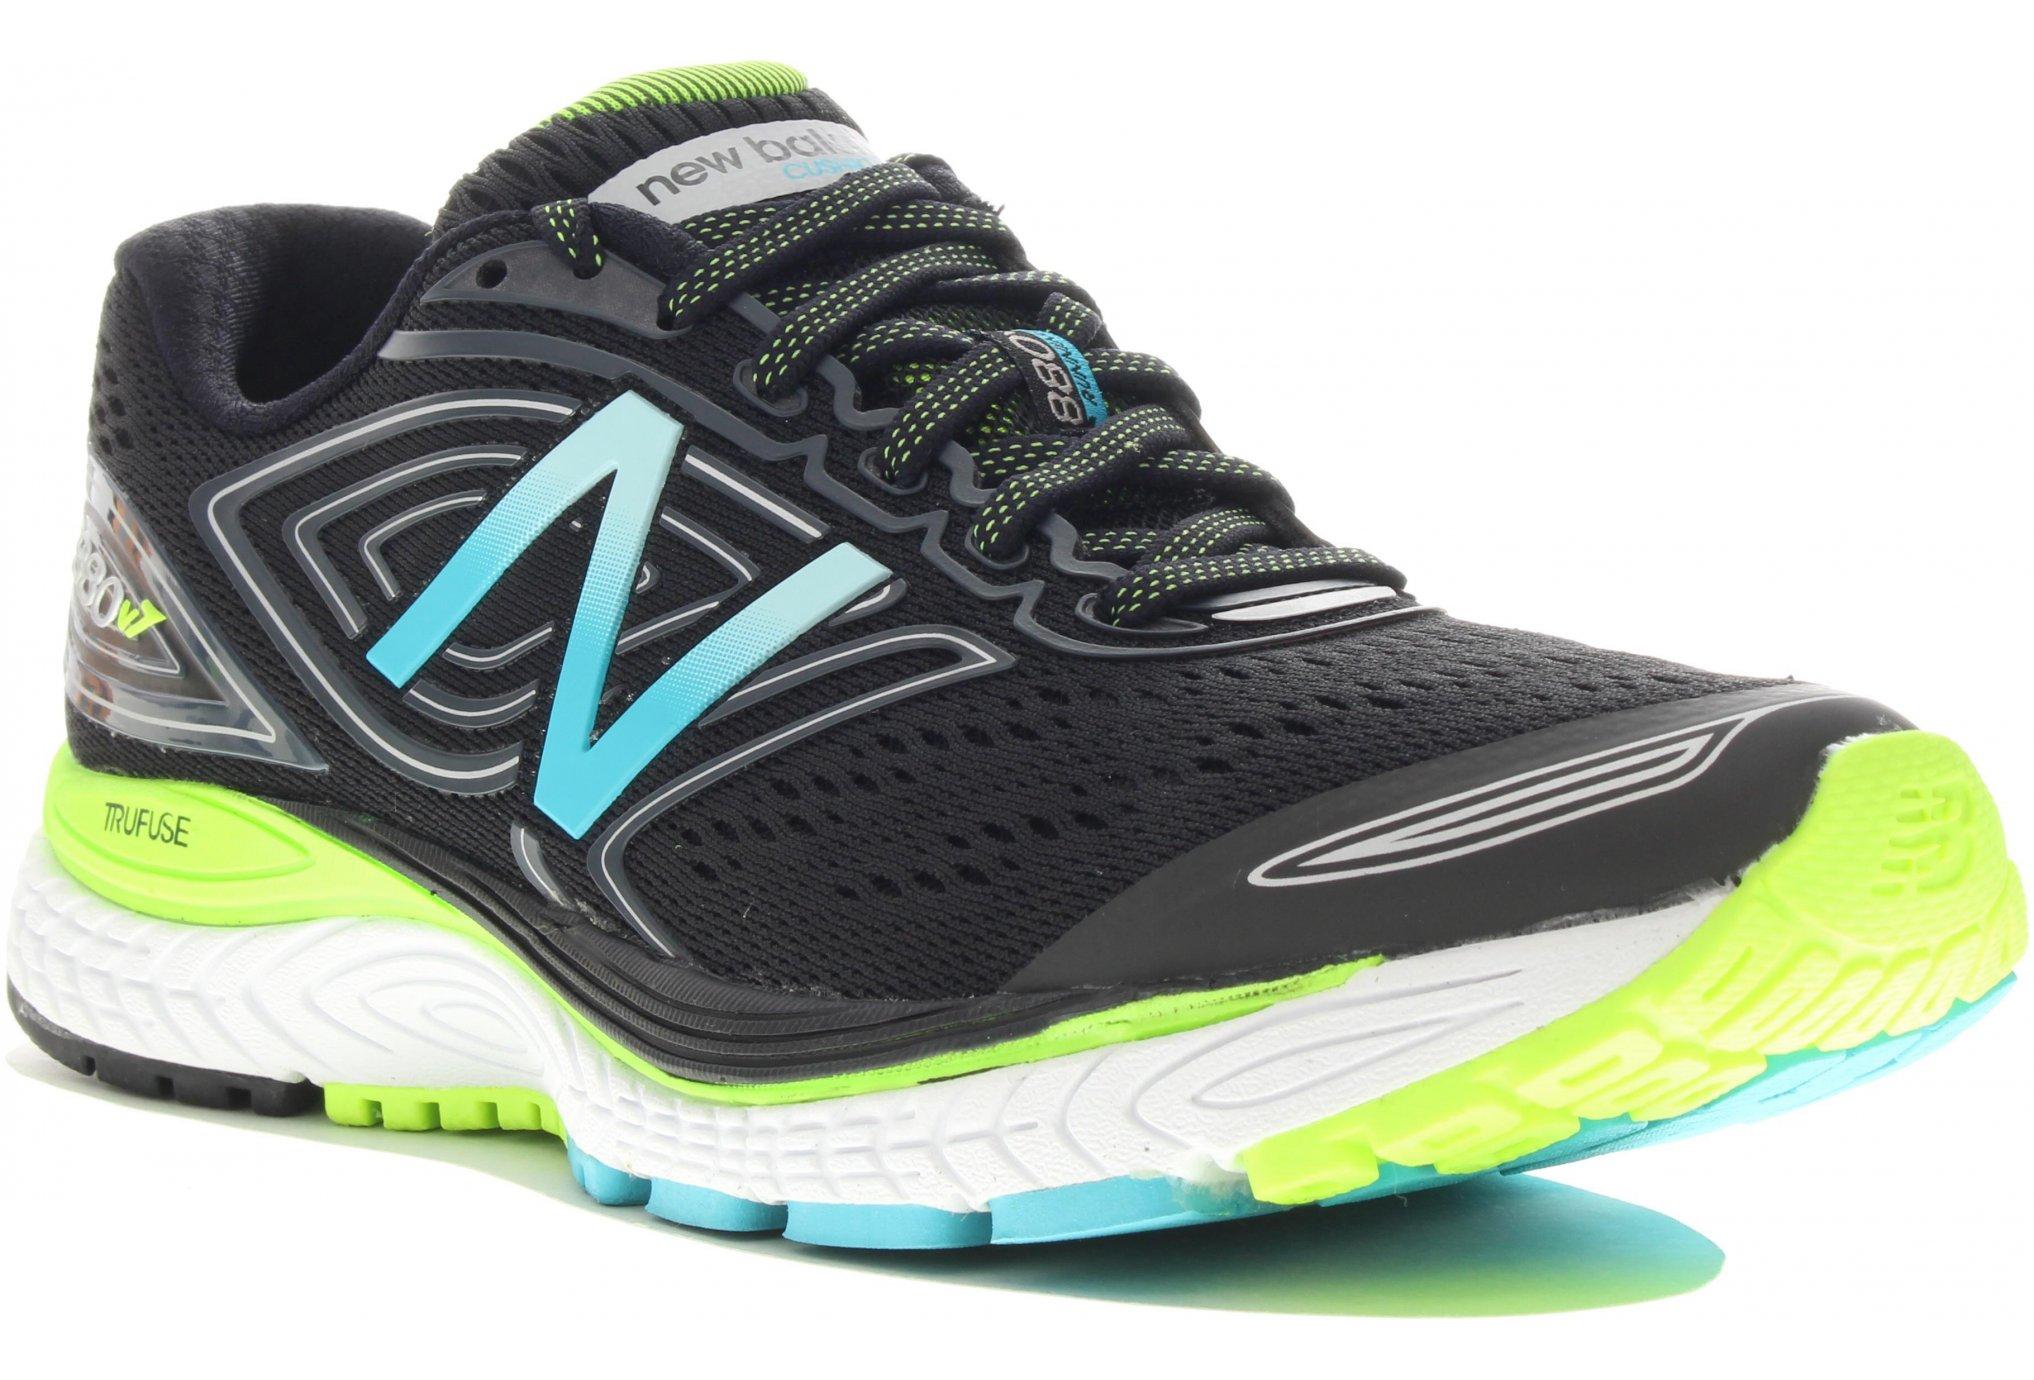 New Balance W 880 V7 - B Chaussures running femme